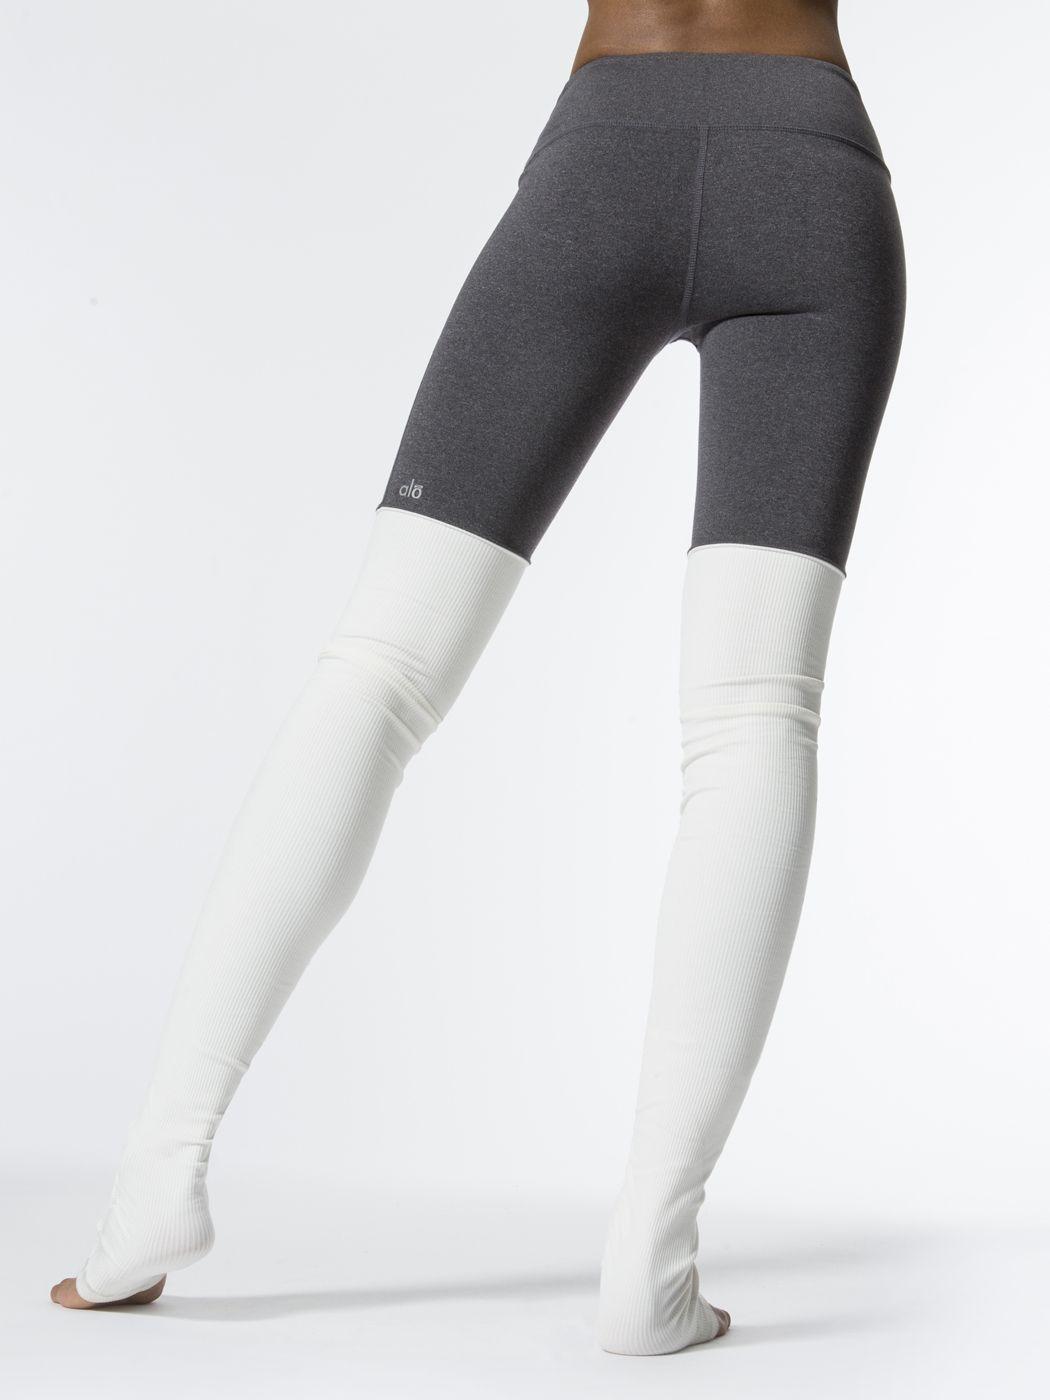 7aa326e0a7d9a ALO YOGA Goddess Legging Stormy Heather/Natural LEGGINGS